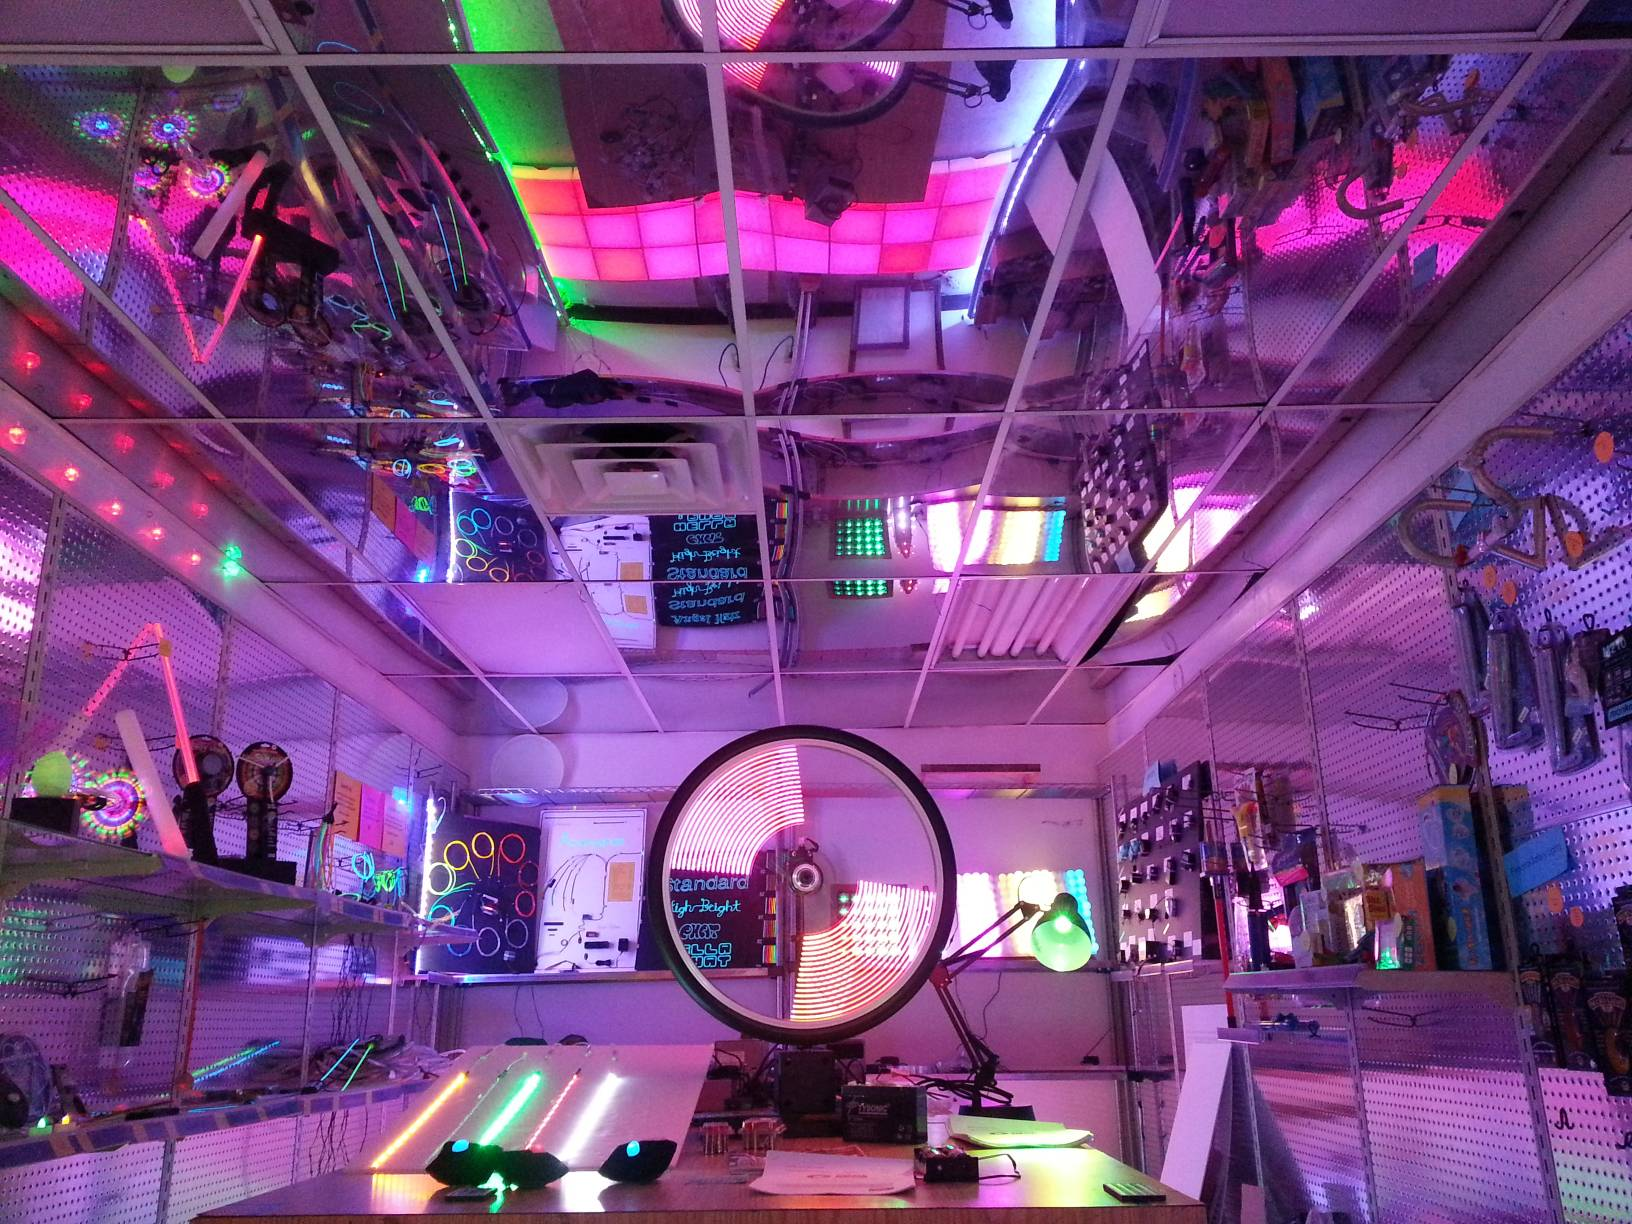 Cool Neon showroom